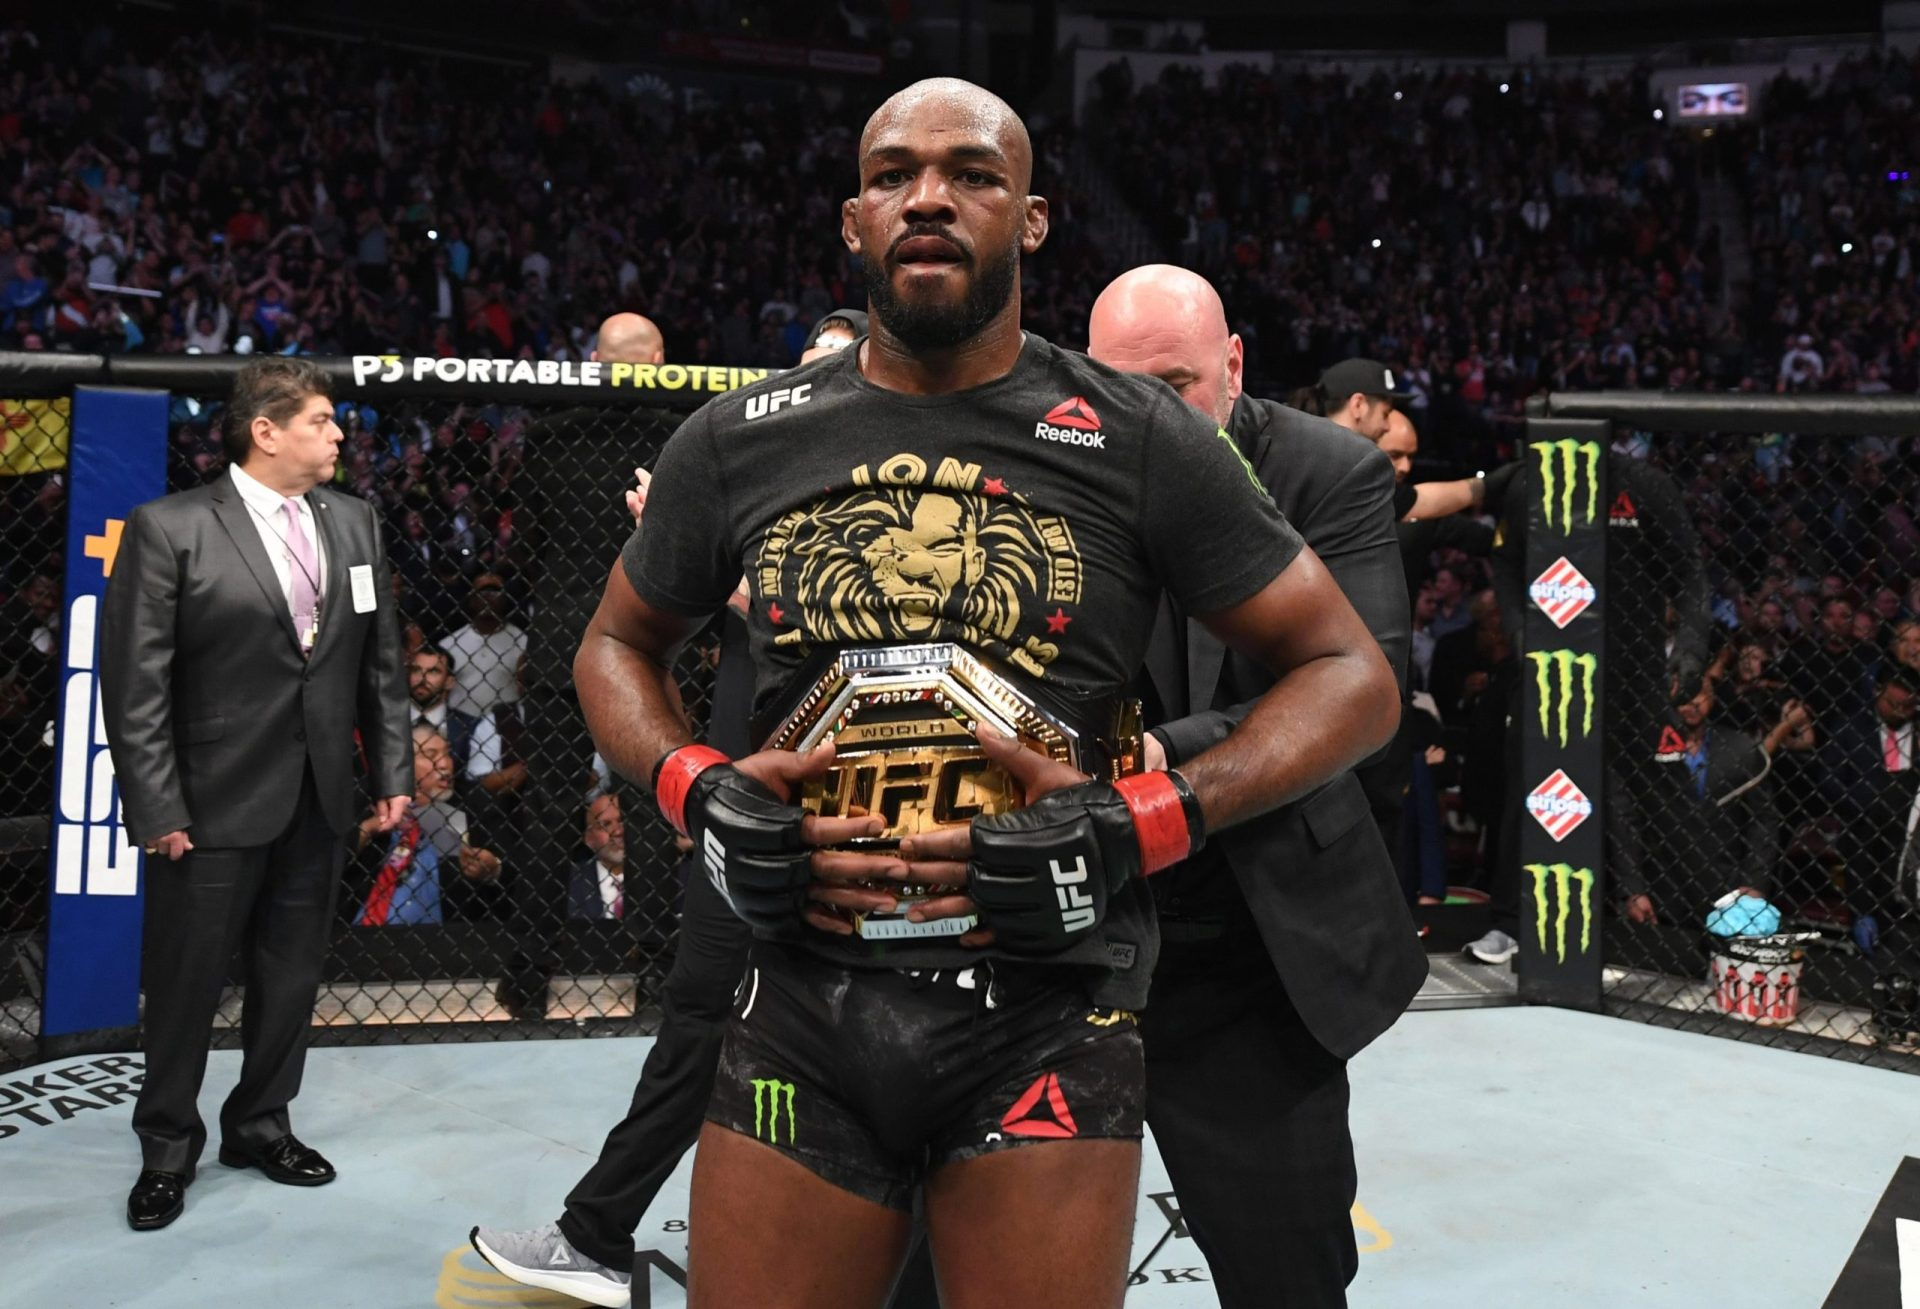 Jon Jones bids adieu to UFC gold: 'Veni vedi veci' - Jon Jones